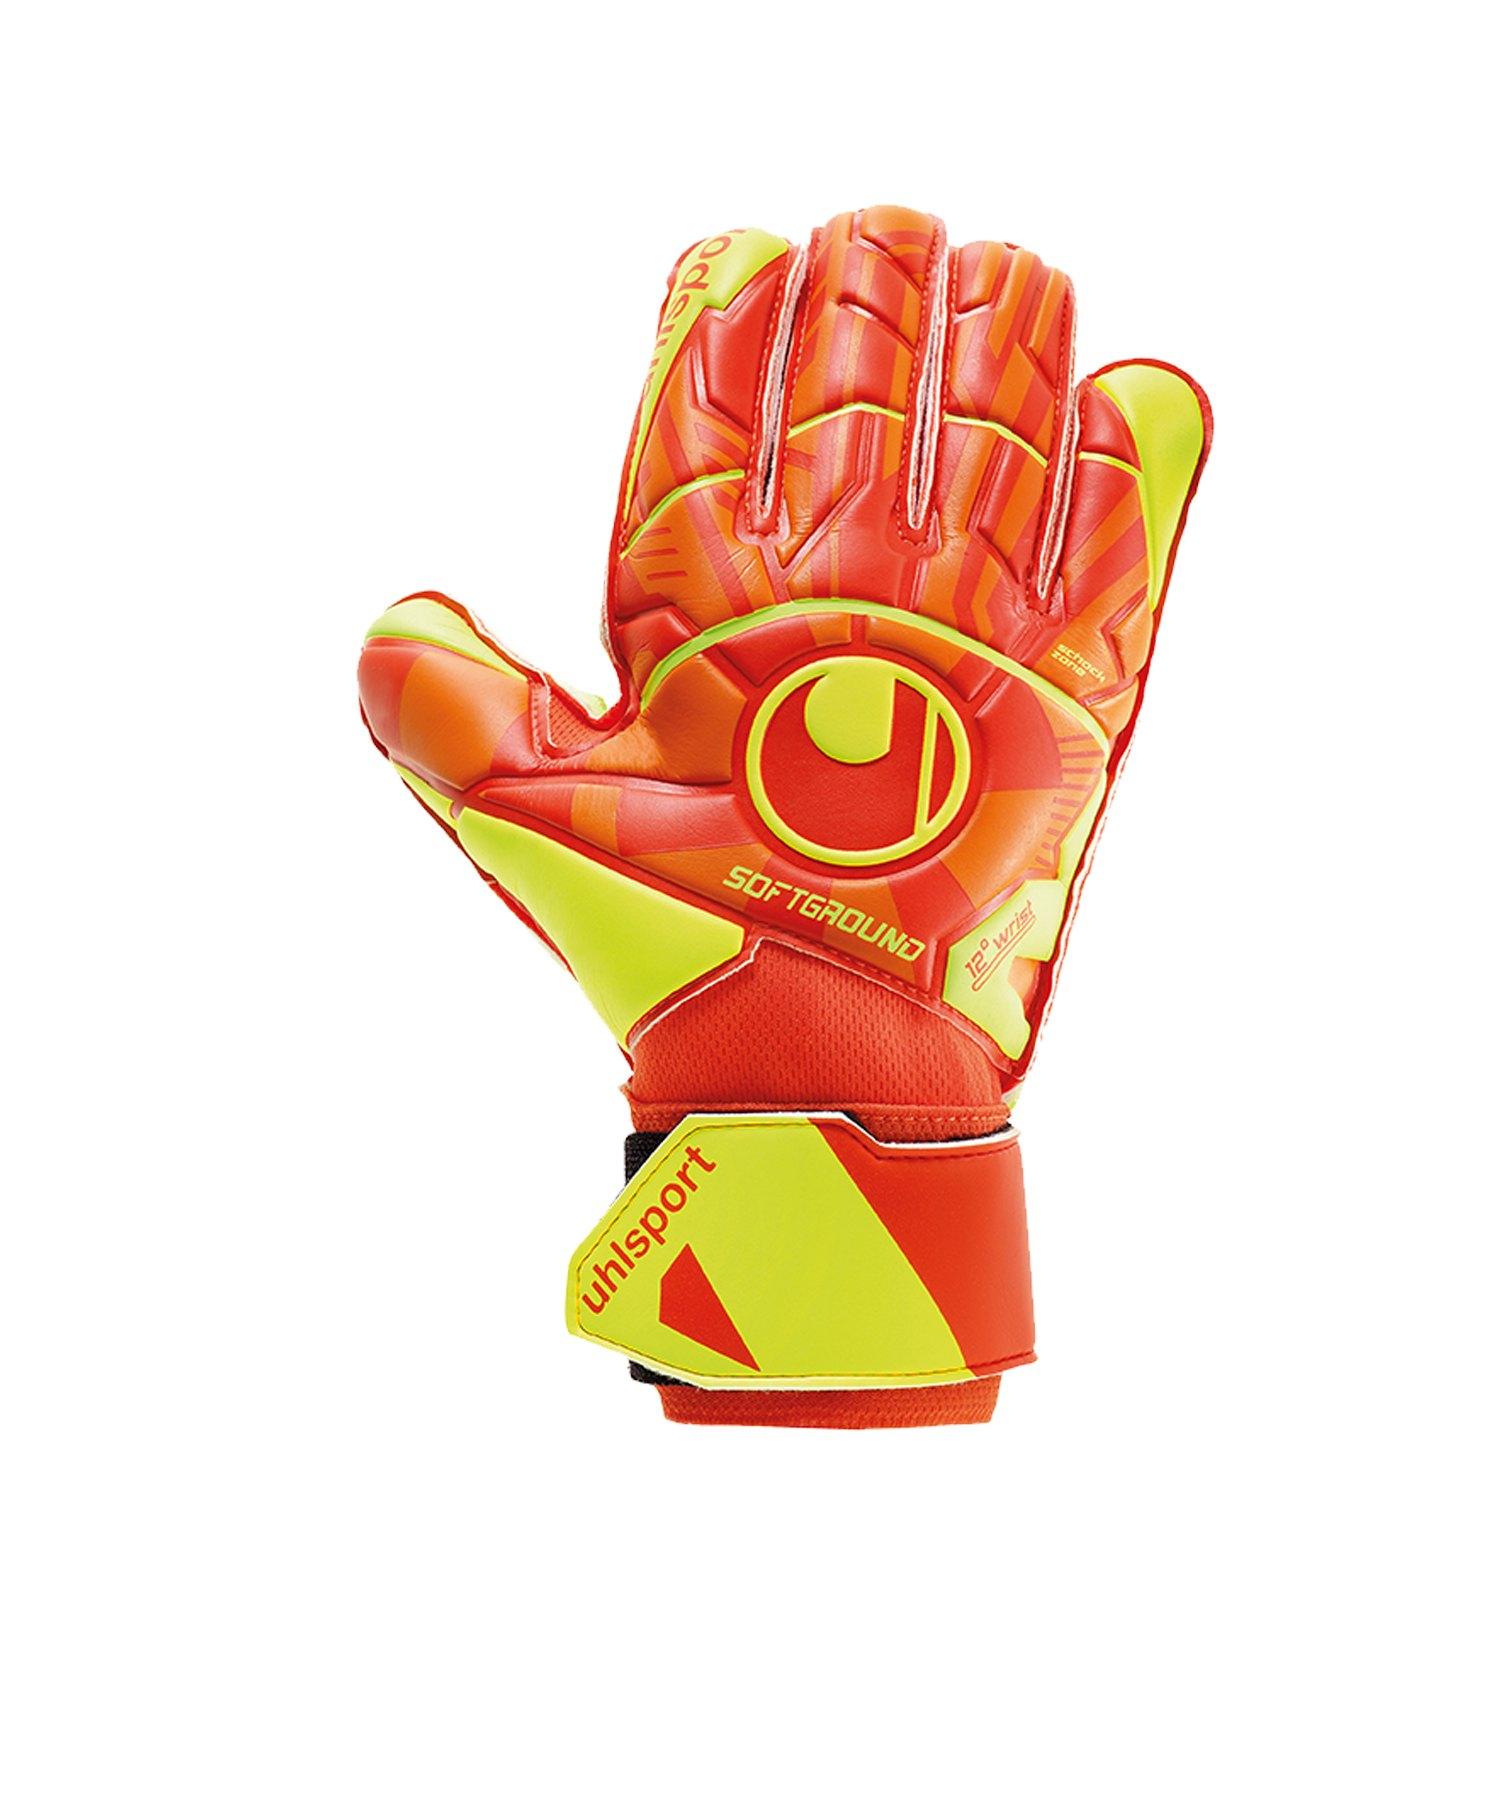 Uhlsport Dyn. Impulse Soft Pro TW-Handschuh F01 - orange